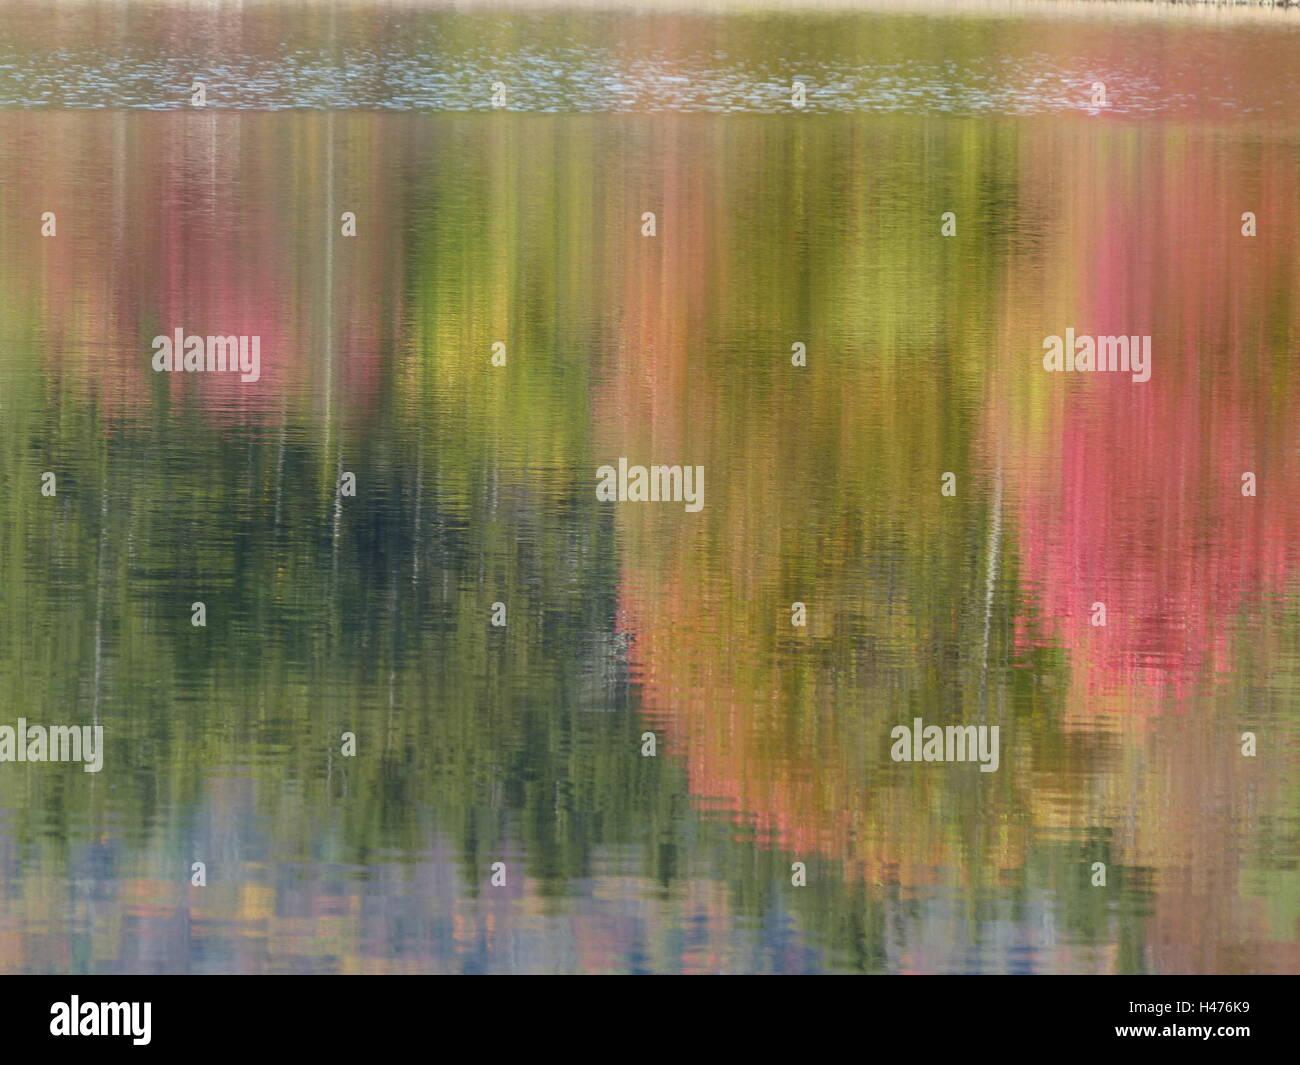 lake, image, water reflection, foliage, colors, mirror image, Indian Summer, warm days, October, heat wave - Stock Image